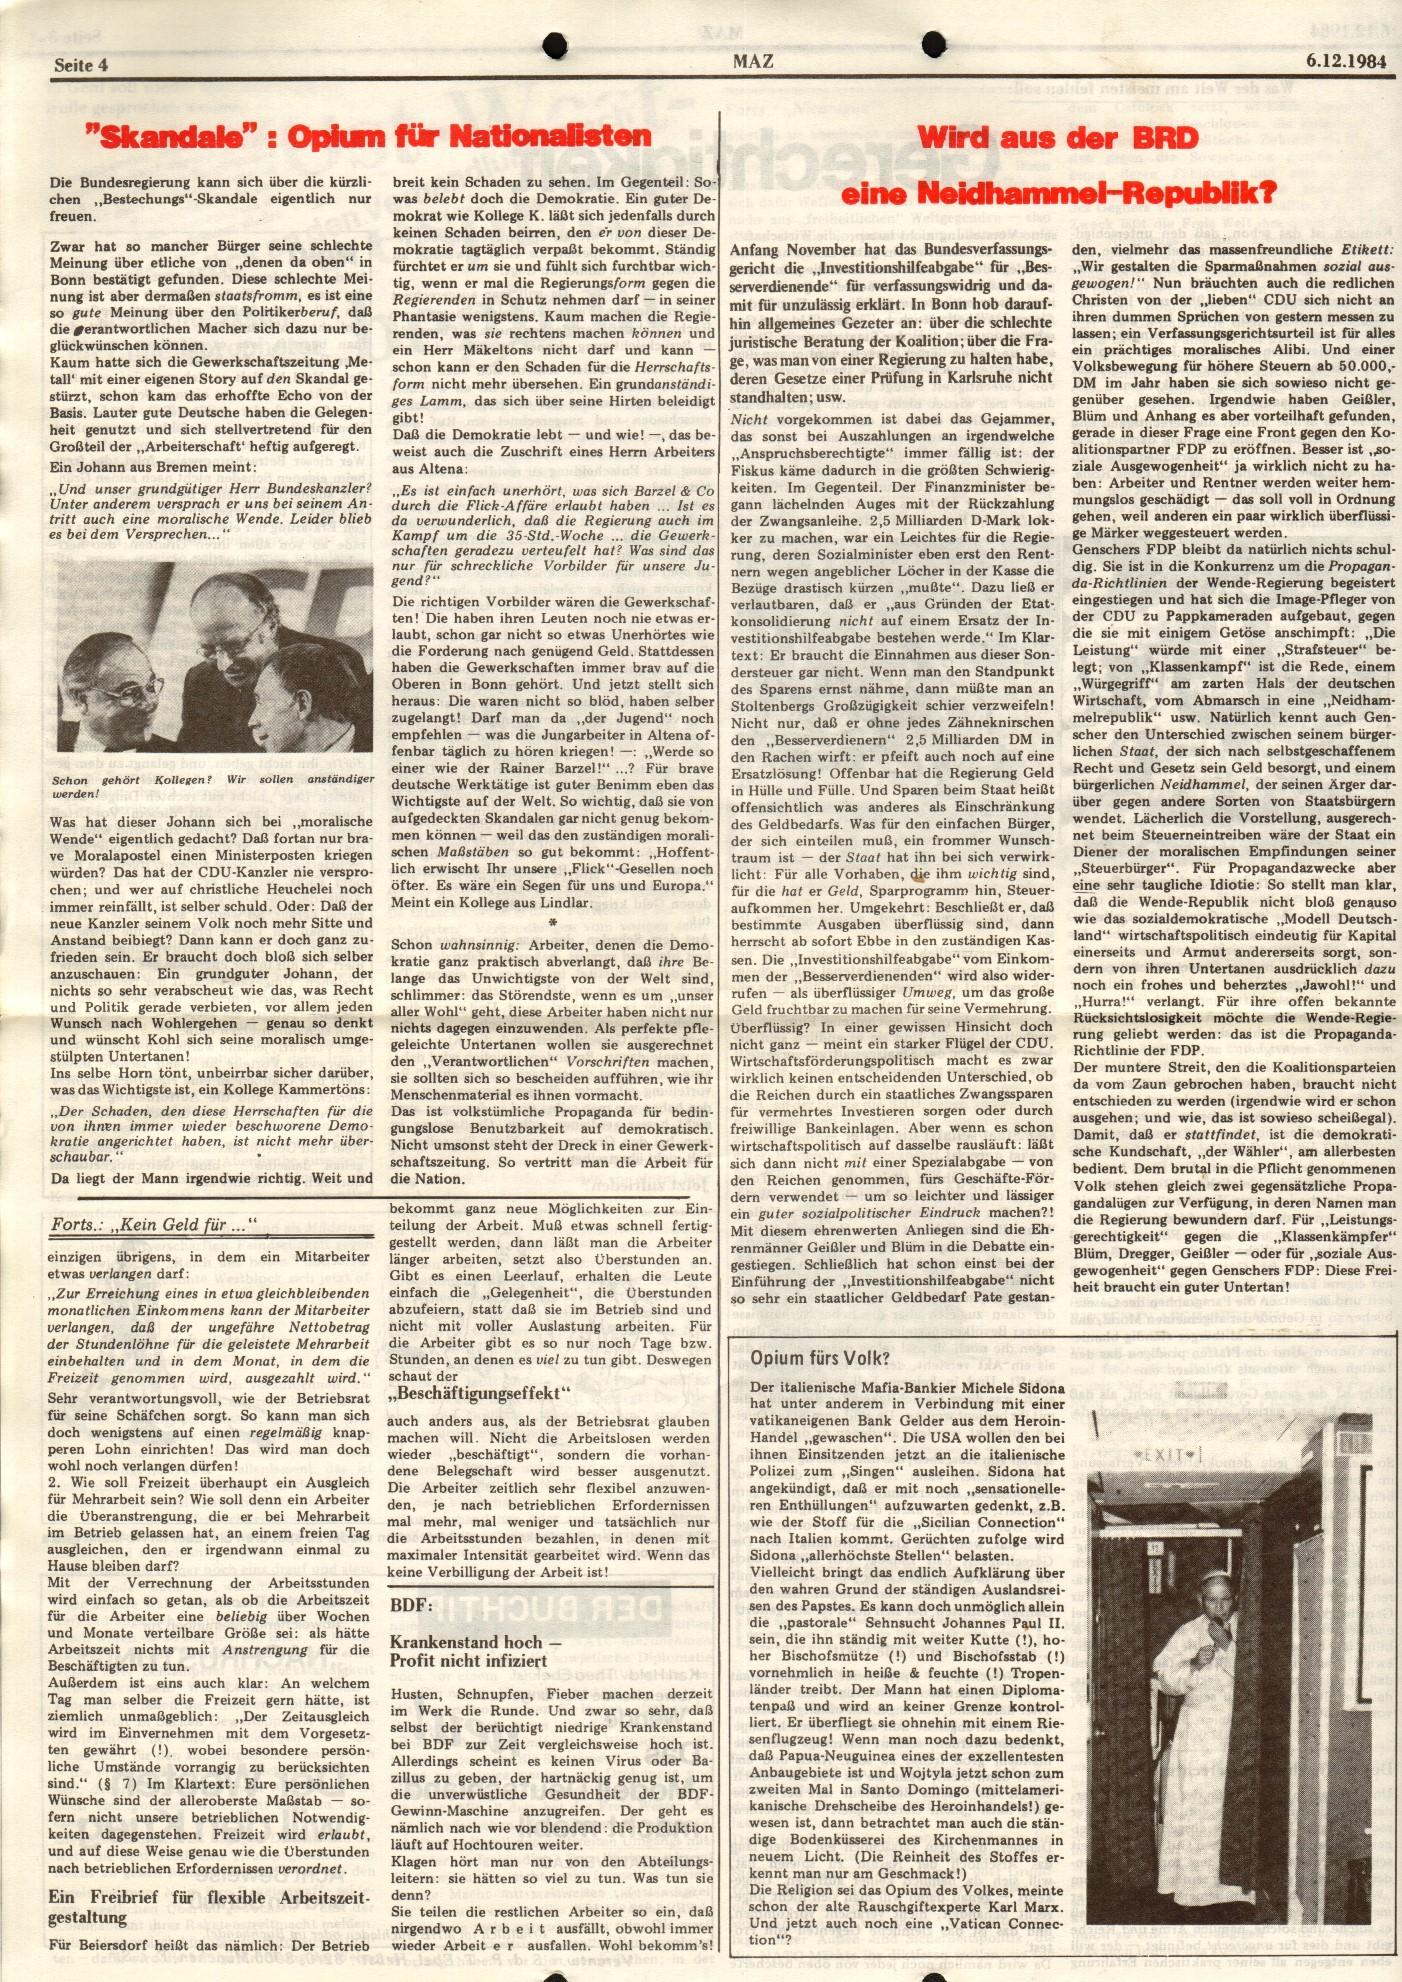 Hamburg_MG_MAZ_Chemie_19841206_04